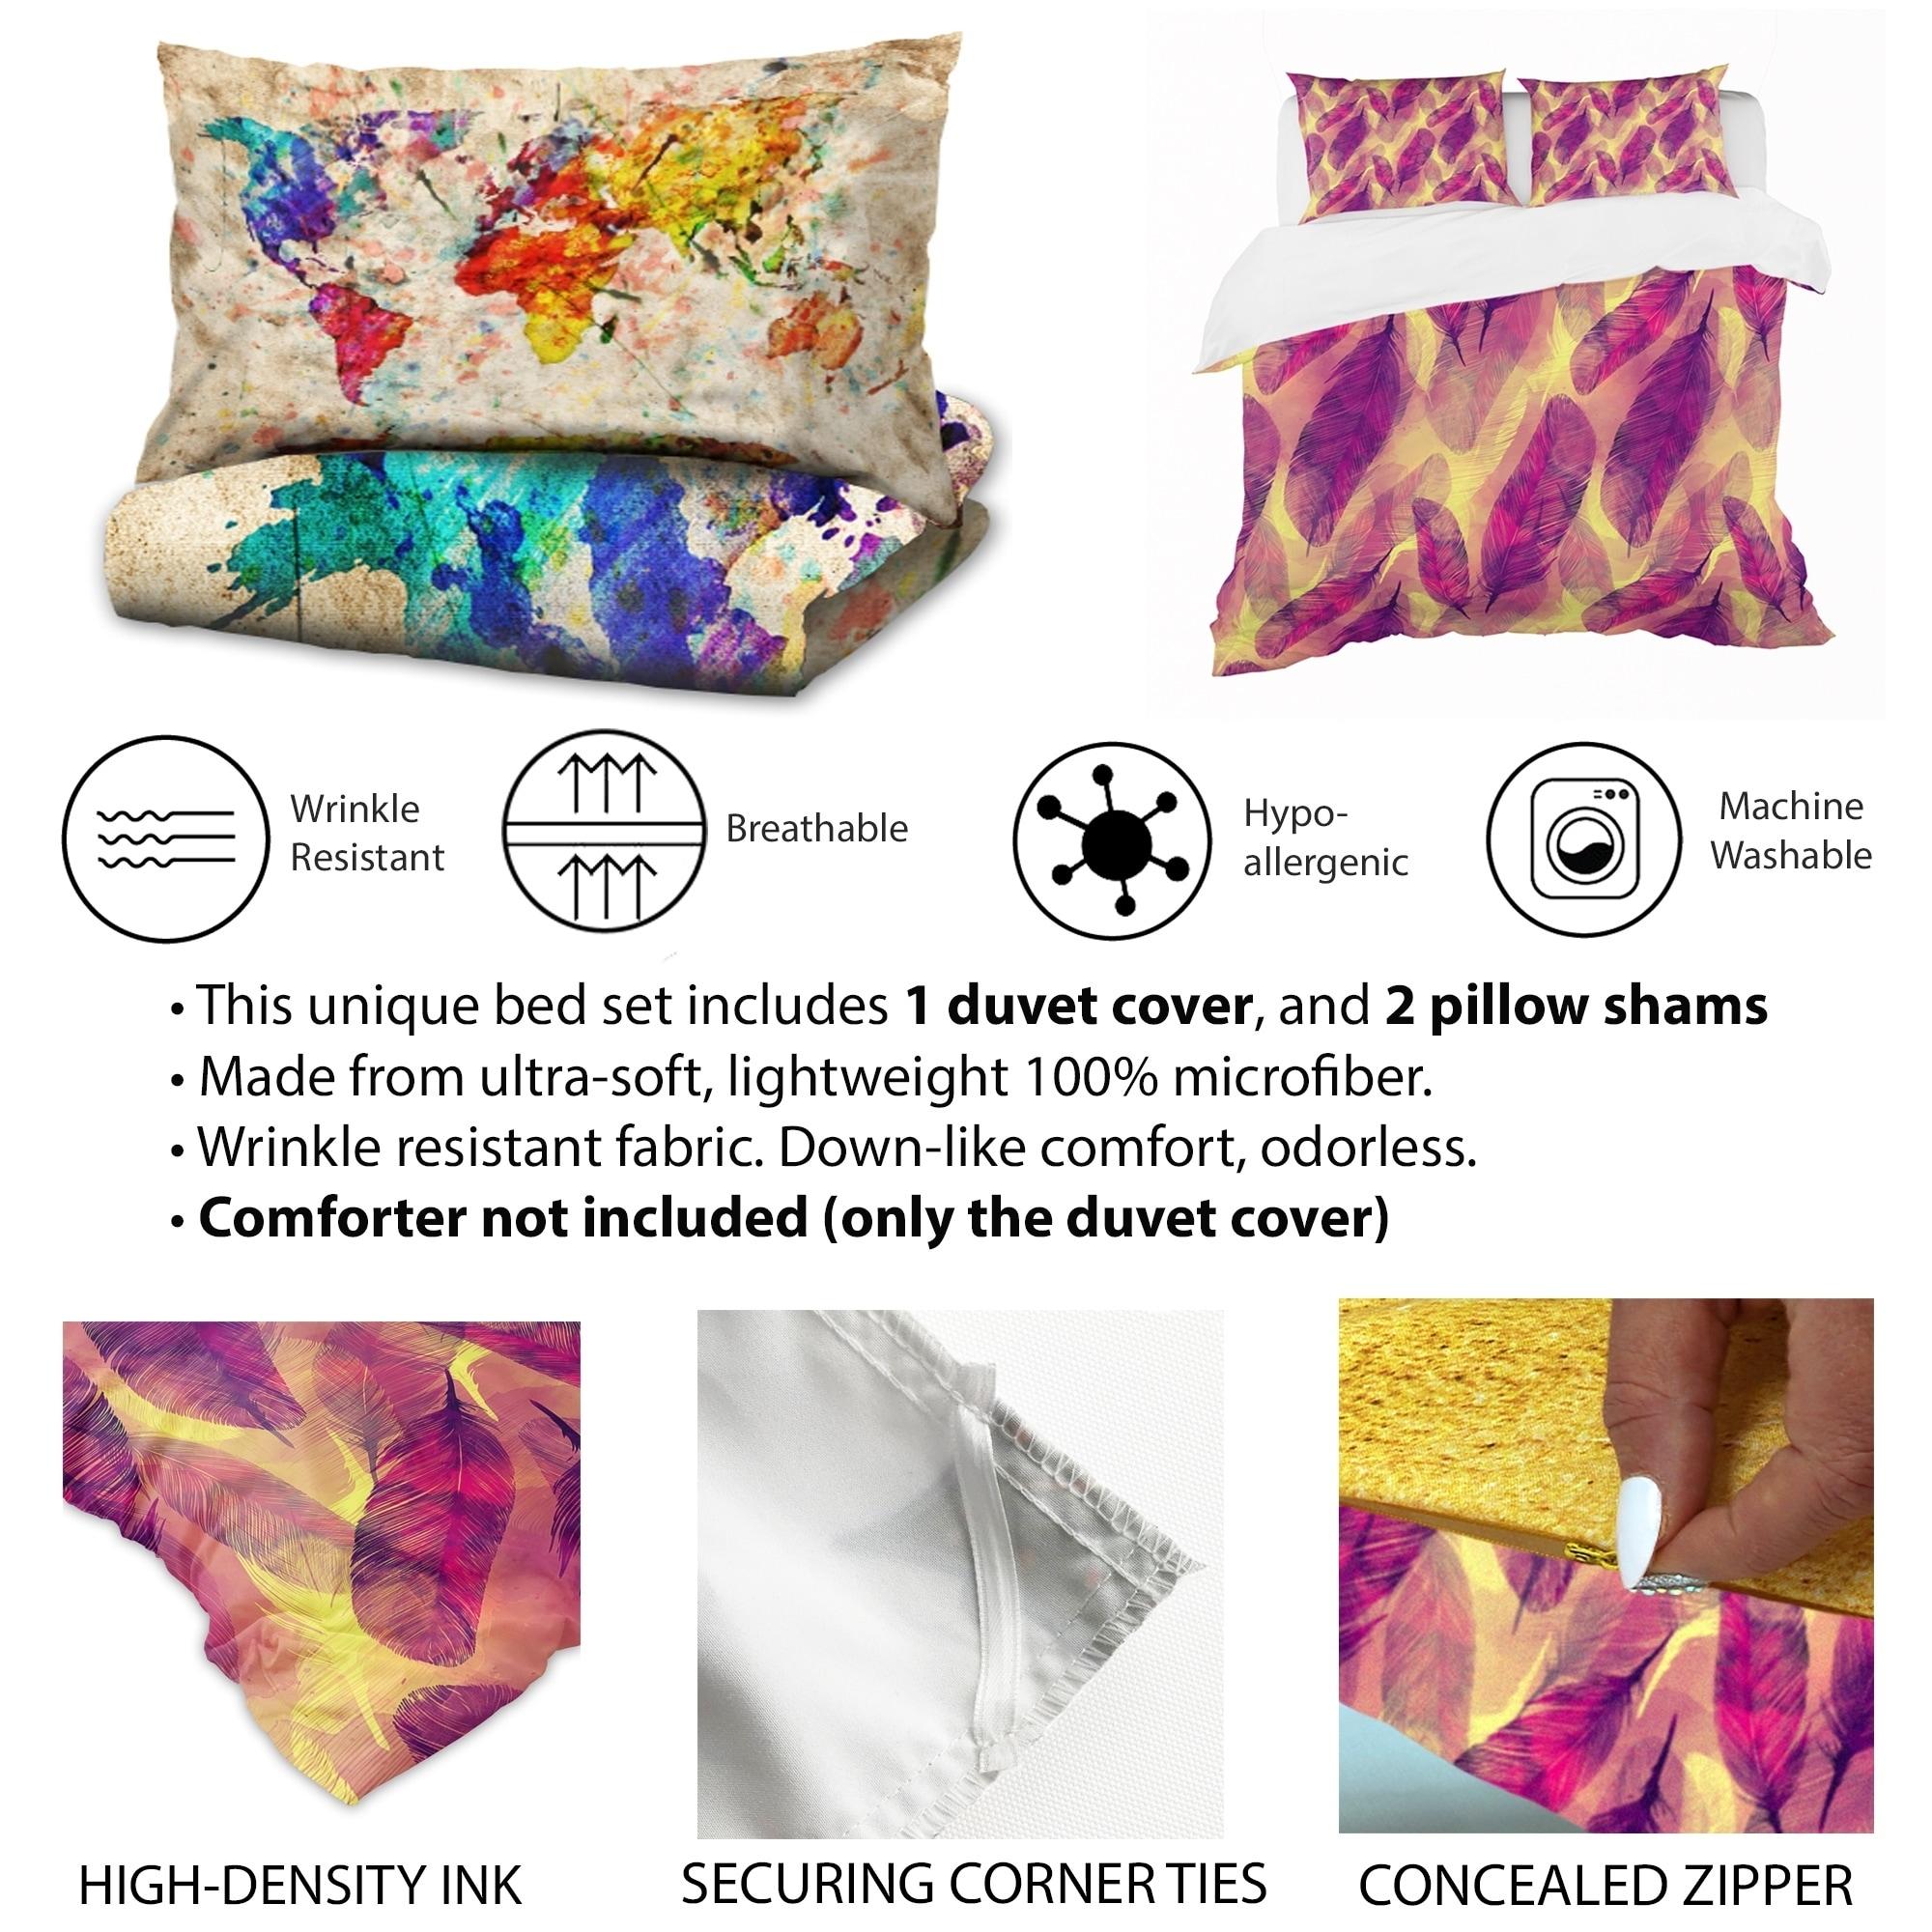 Designart Emerald Energy Green Abstract Modern Contemporary Bedding Set Duvet Cover Shams On Sale Overstock 23506892